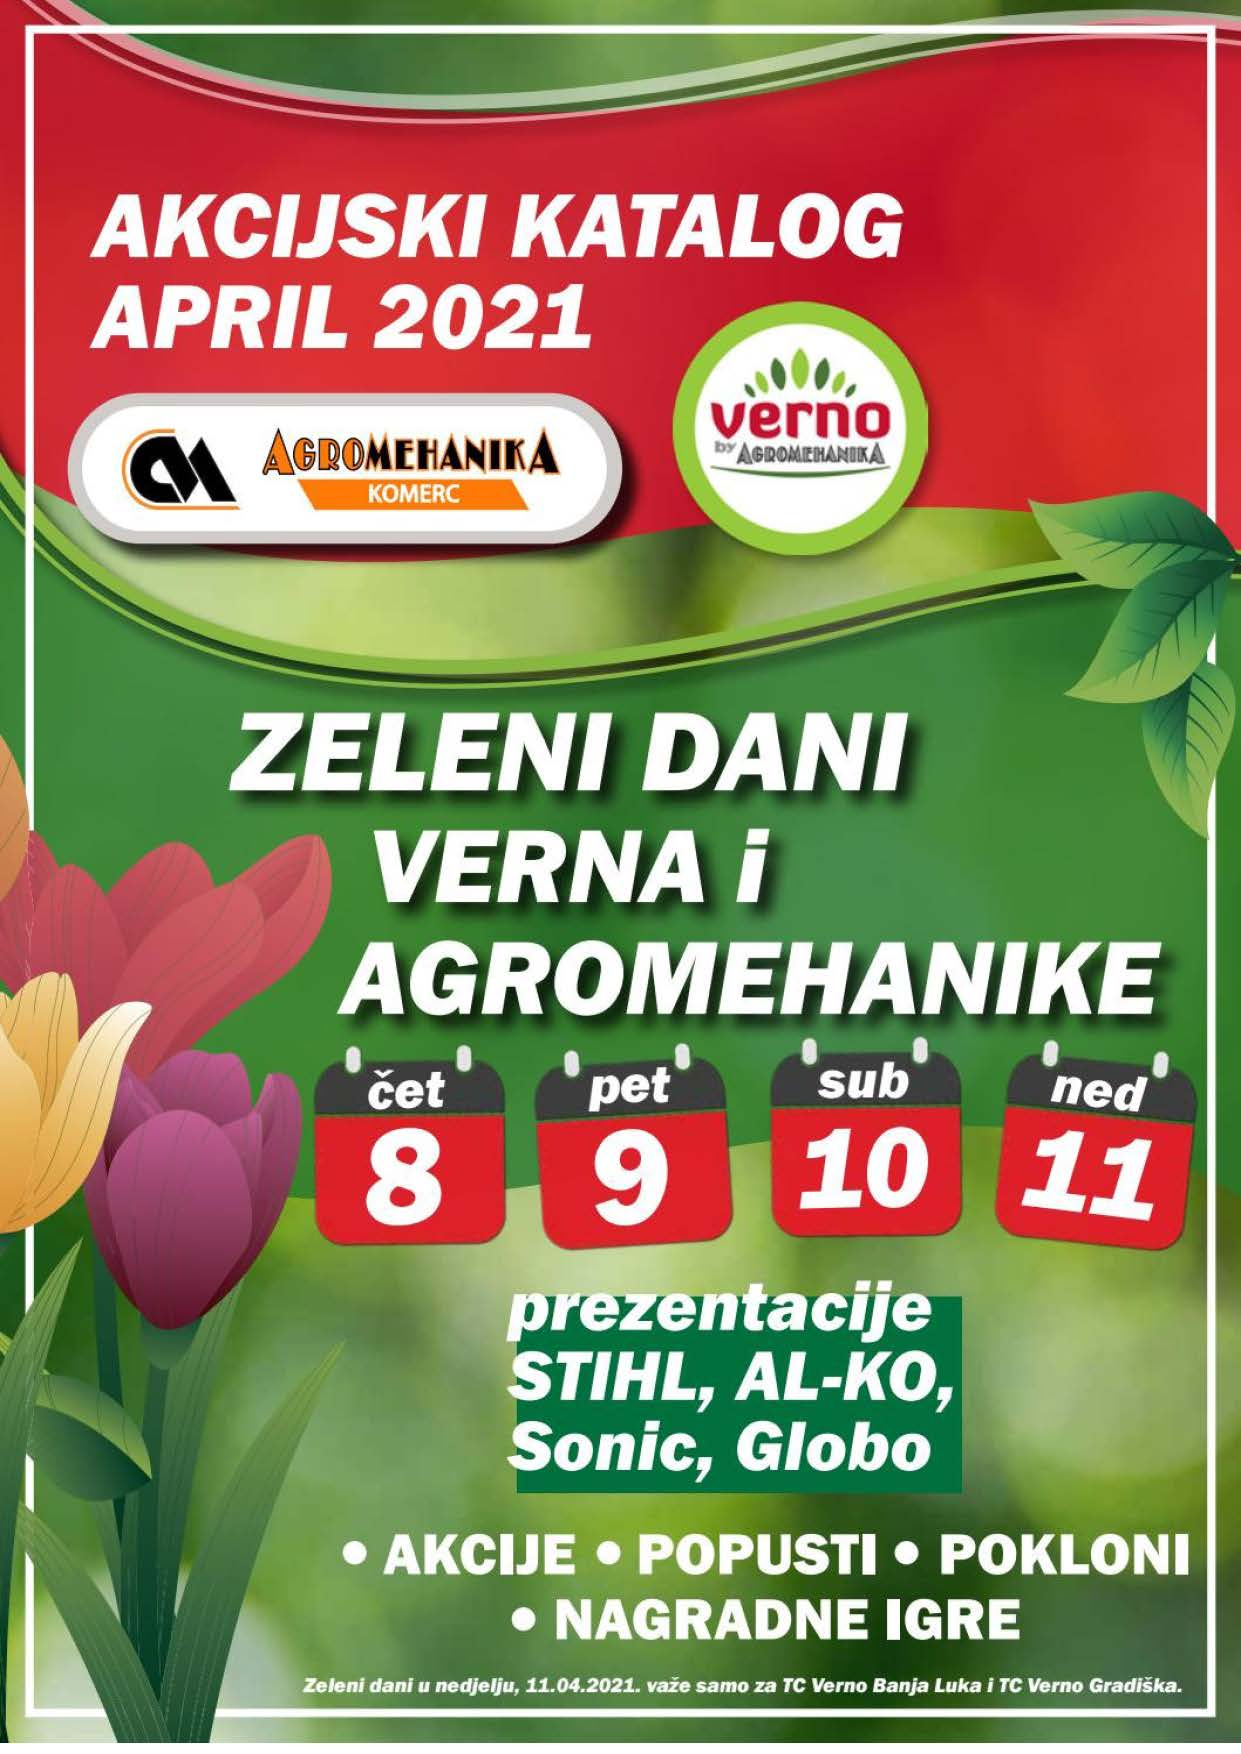 VERNO AGROMEHANIKA Akcijski Katalog APRIL 2021 ekatalozi.com Page 01